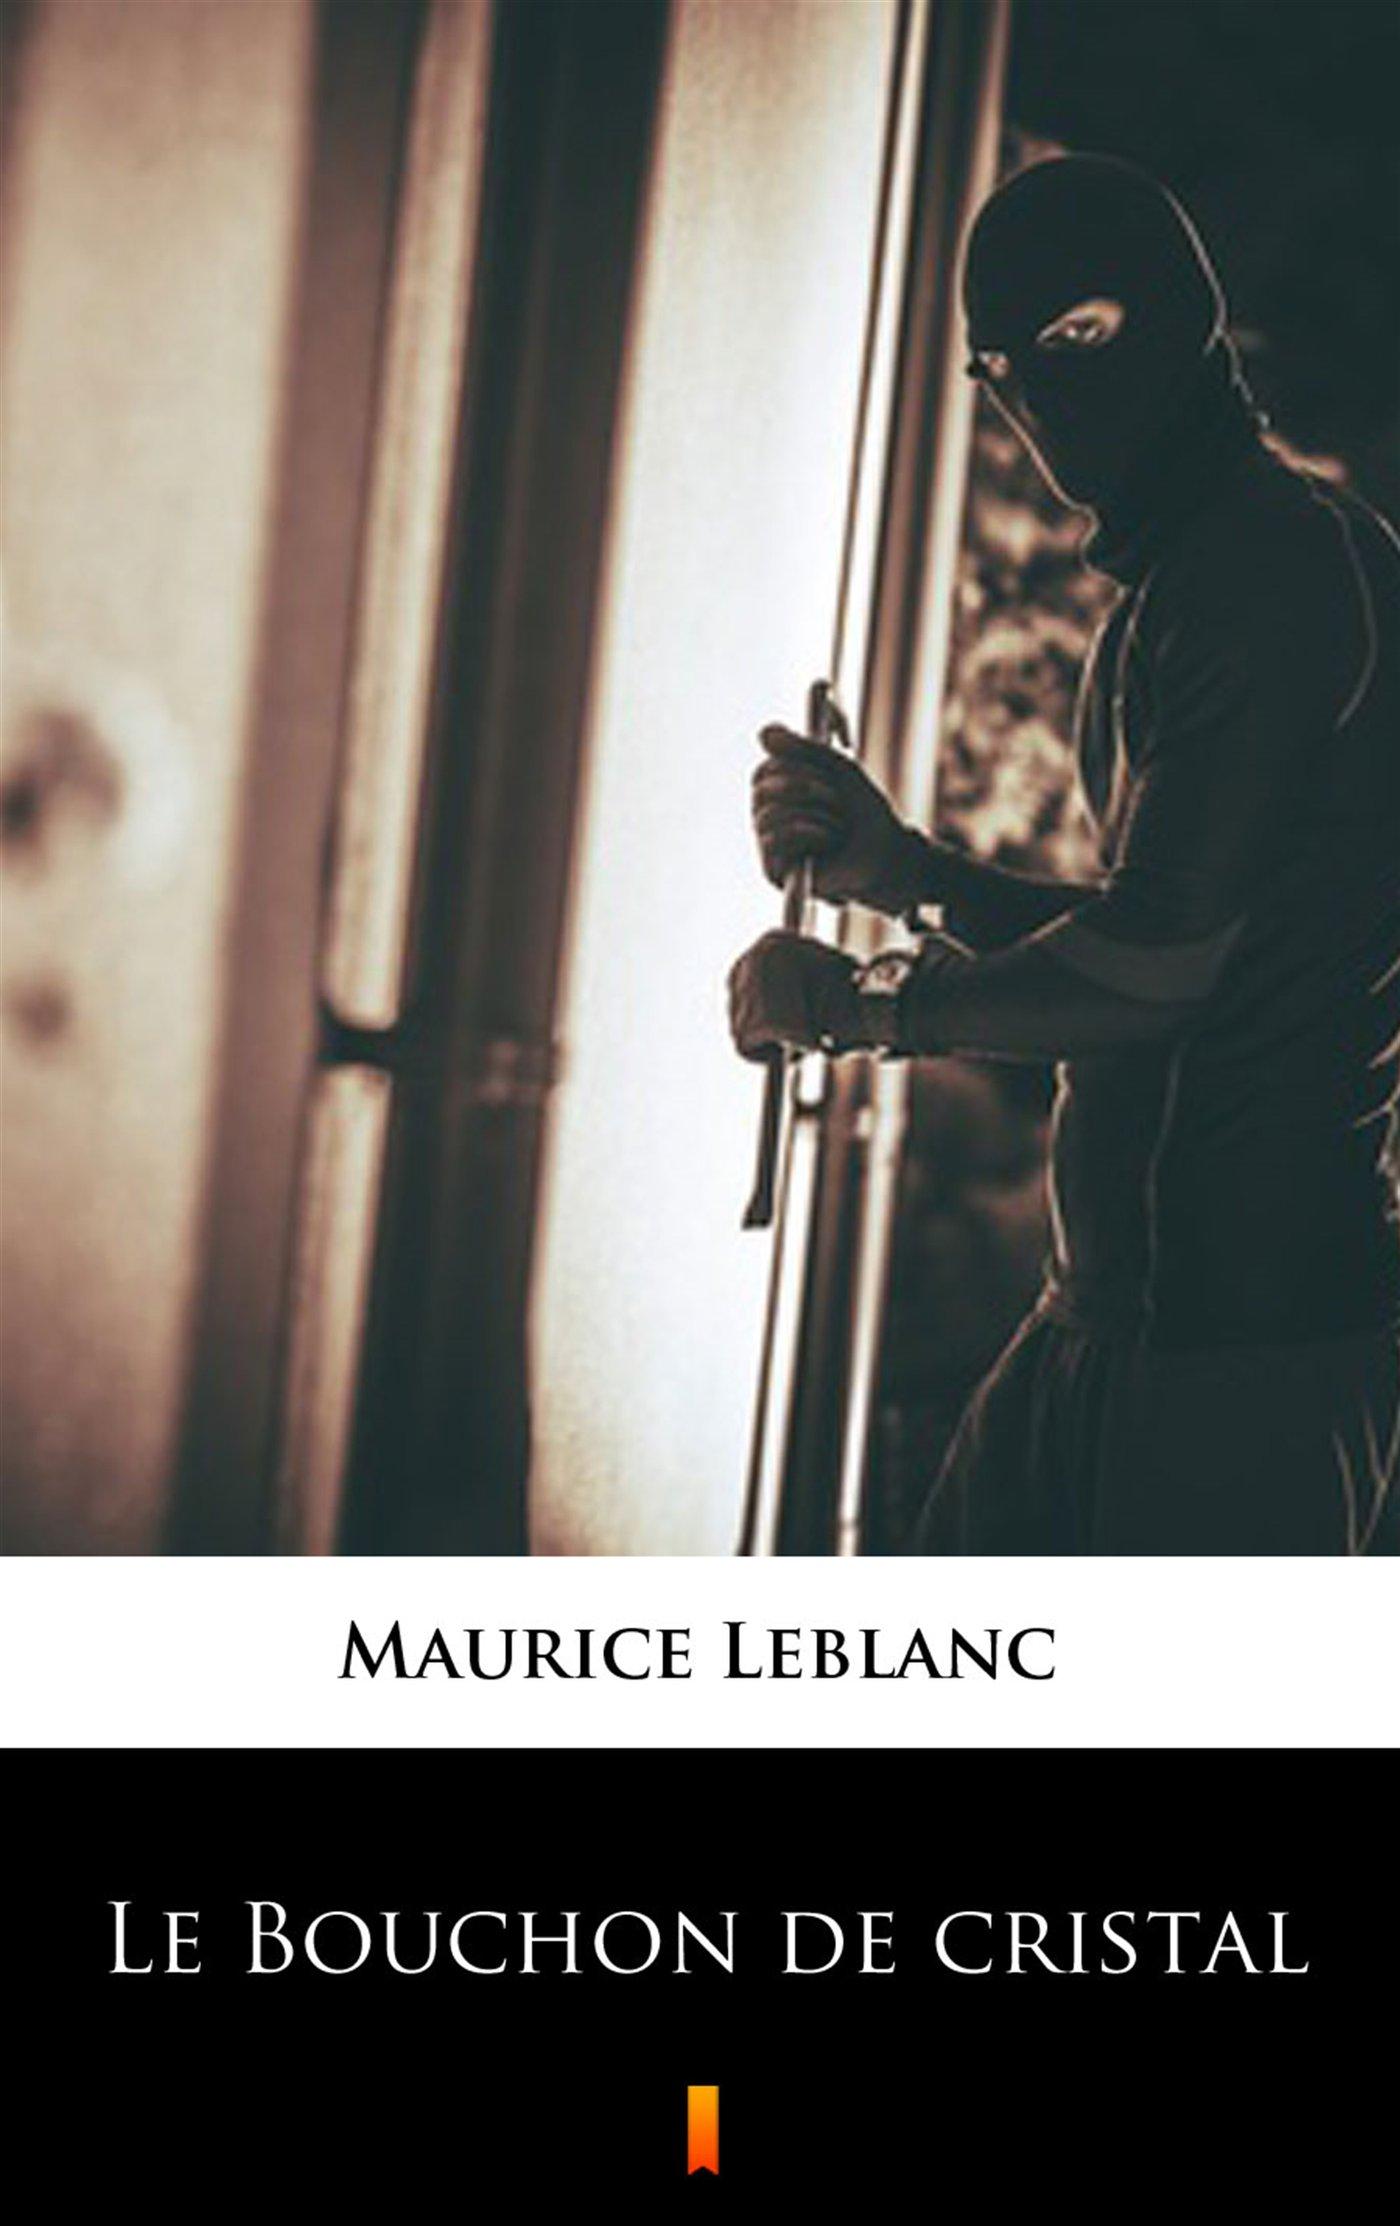 Le Bouchon de cristal - Ebook (Książka na Kindle) do pobrania w formacie MOBI